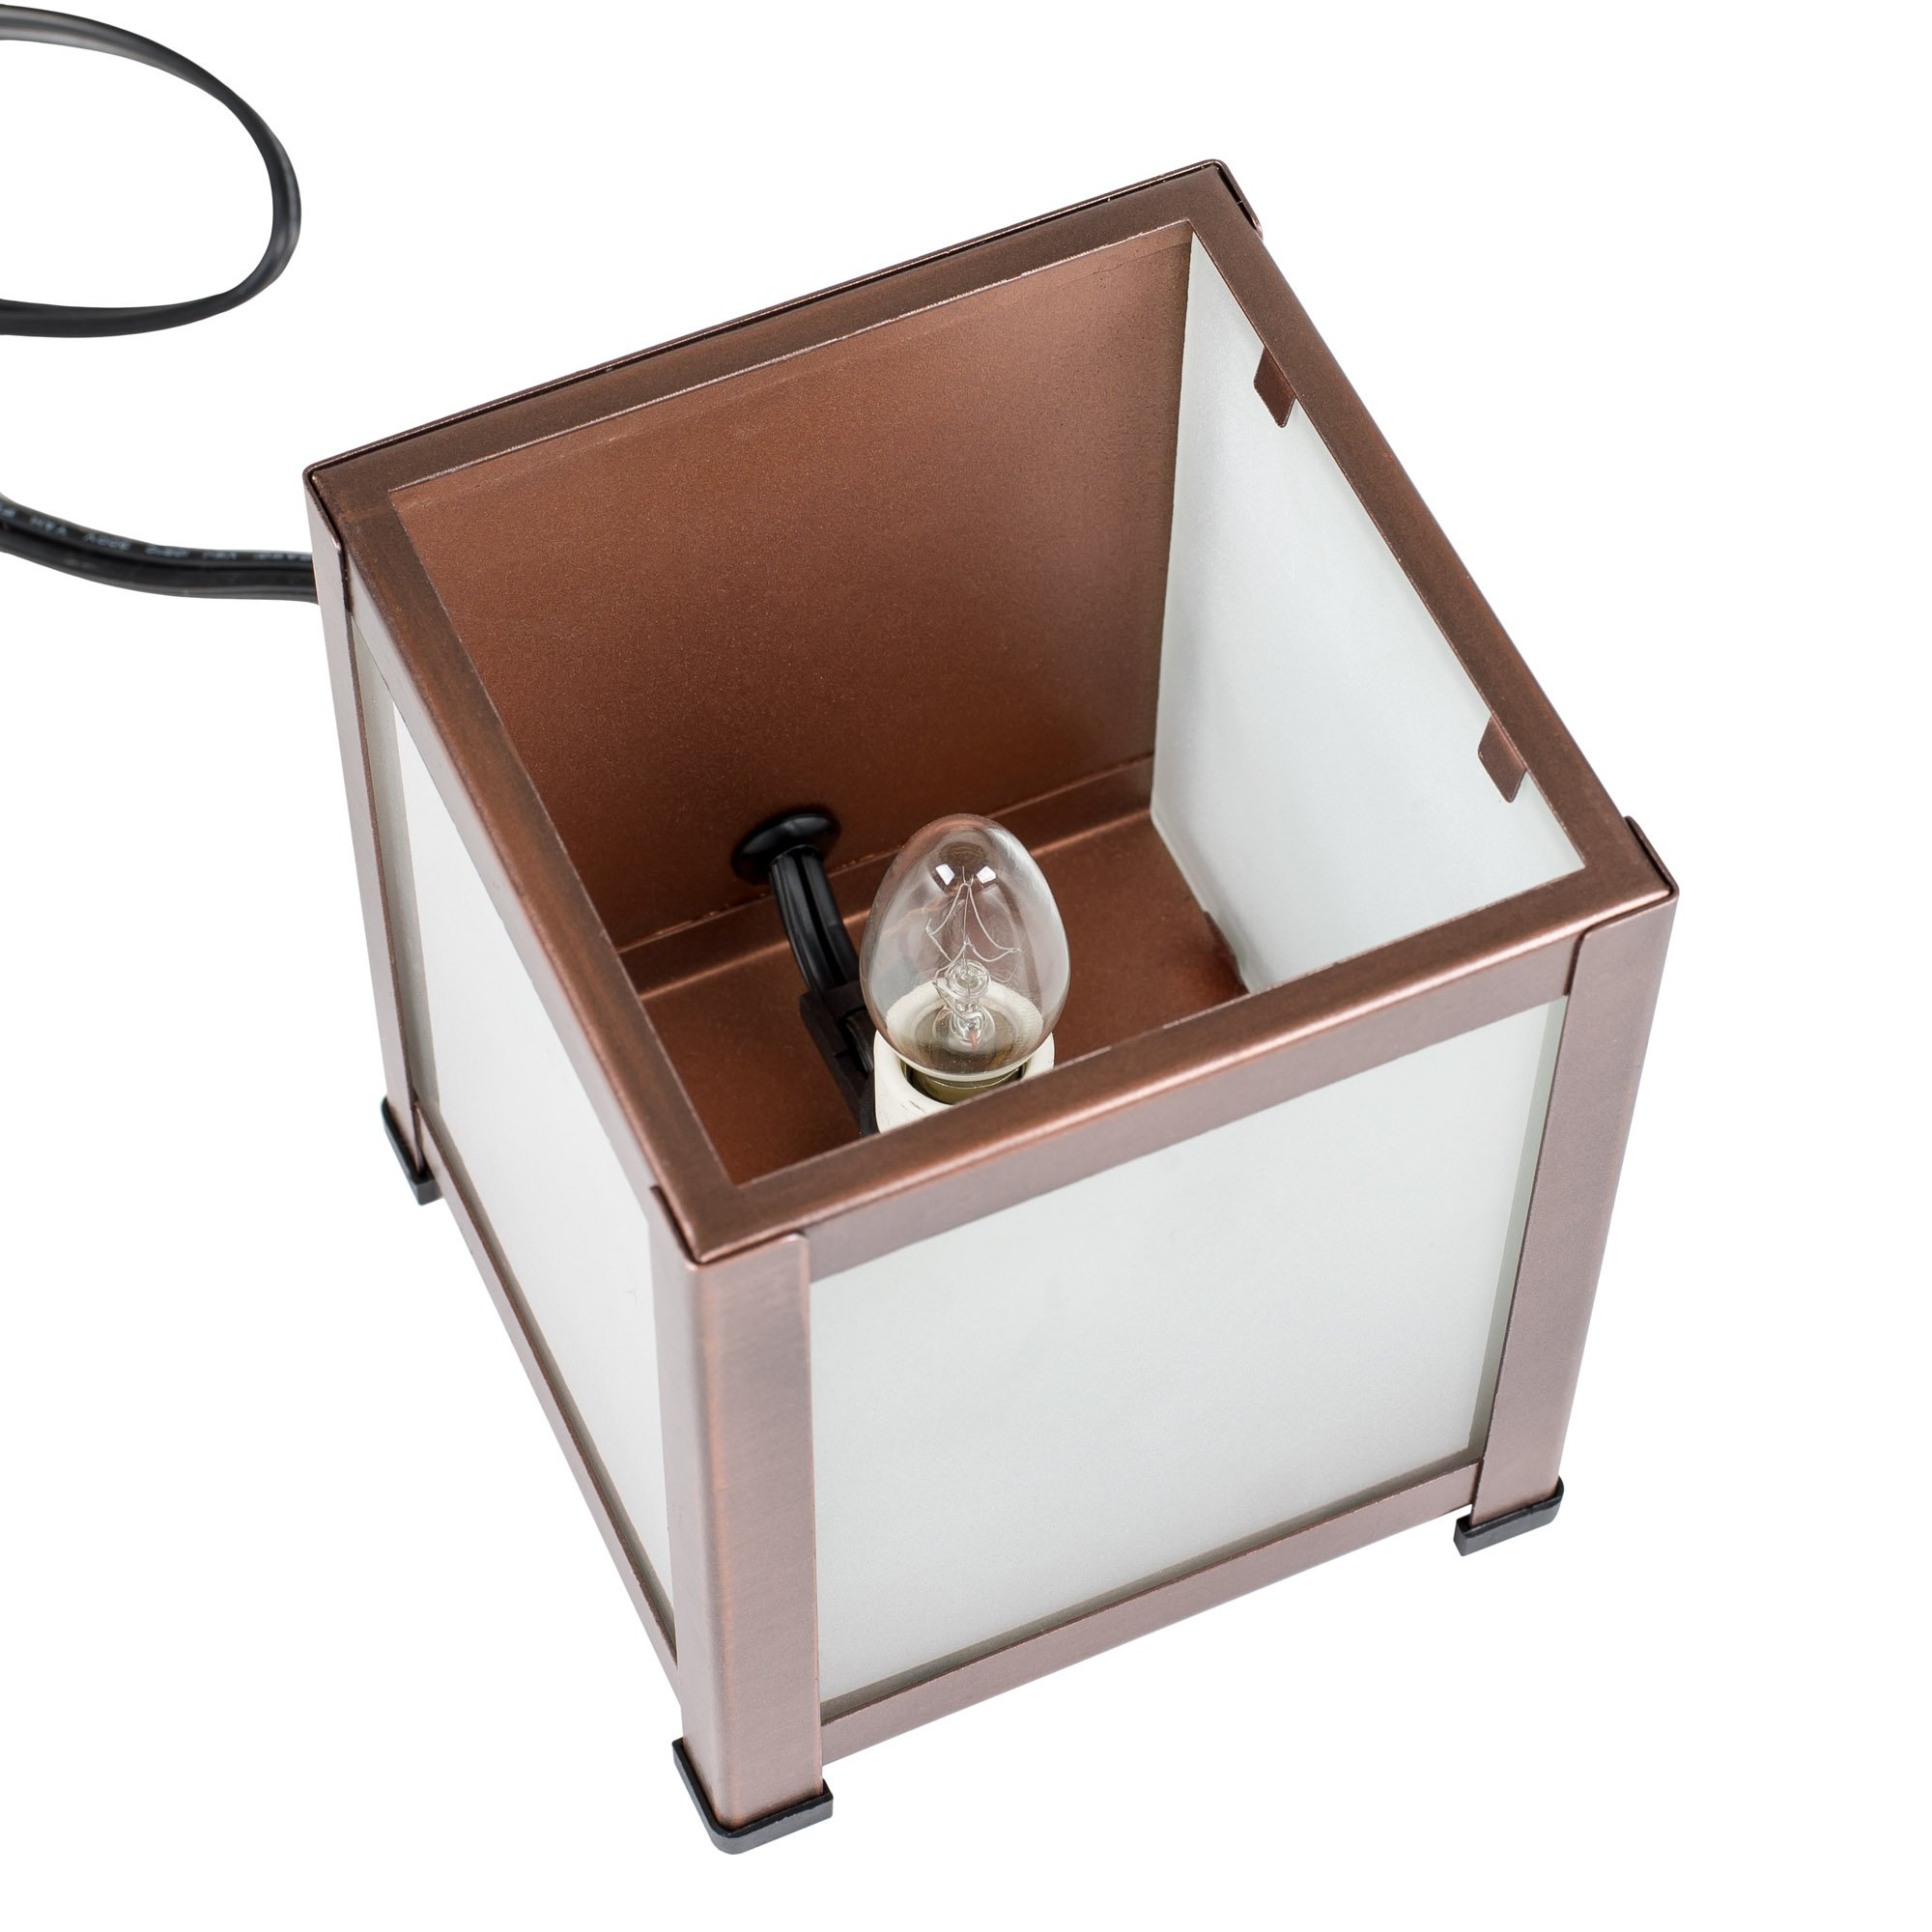 Elanze Designs Enjoy Simple Things Dragonfly Copper Tone Metal Electrical Wax Tart & Oil Glass Lantern Warmer by Elanze Designs (Image #3)